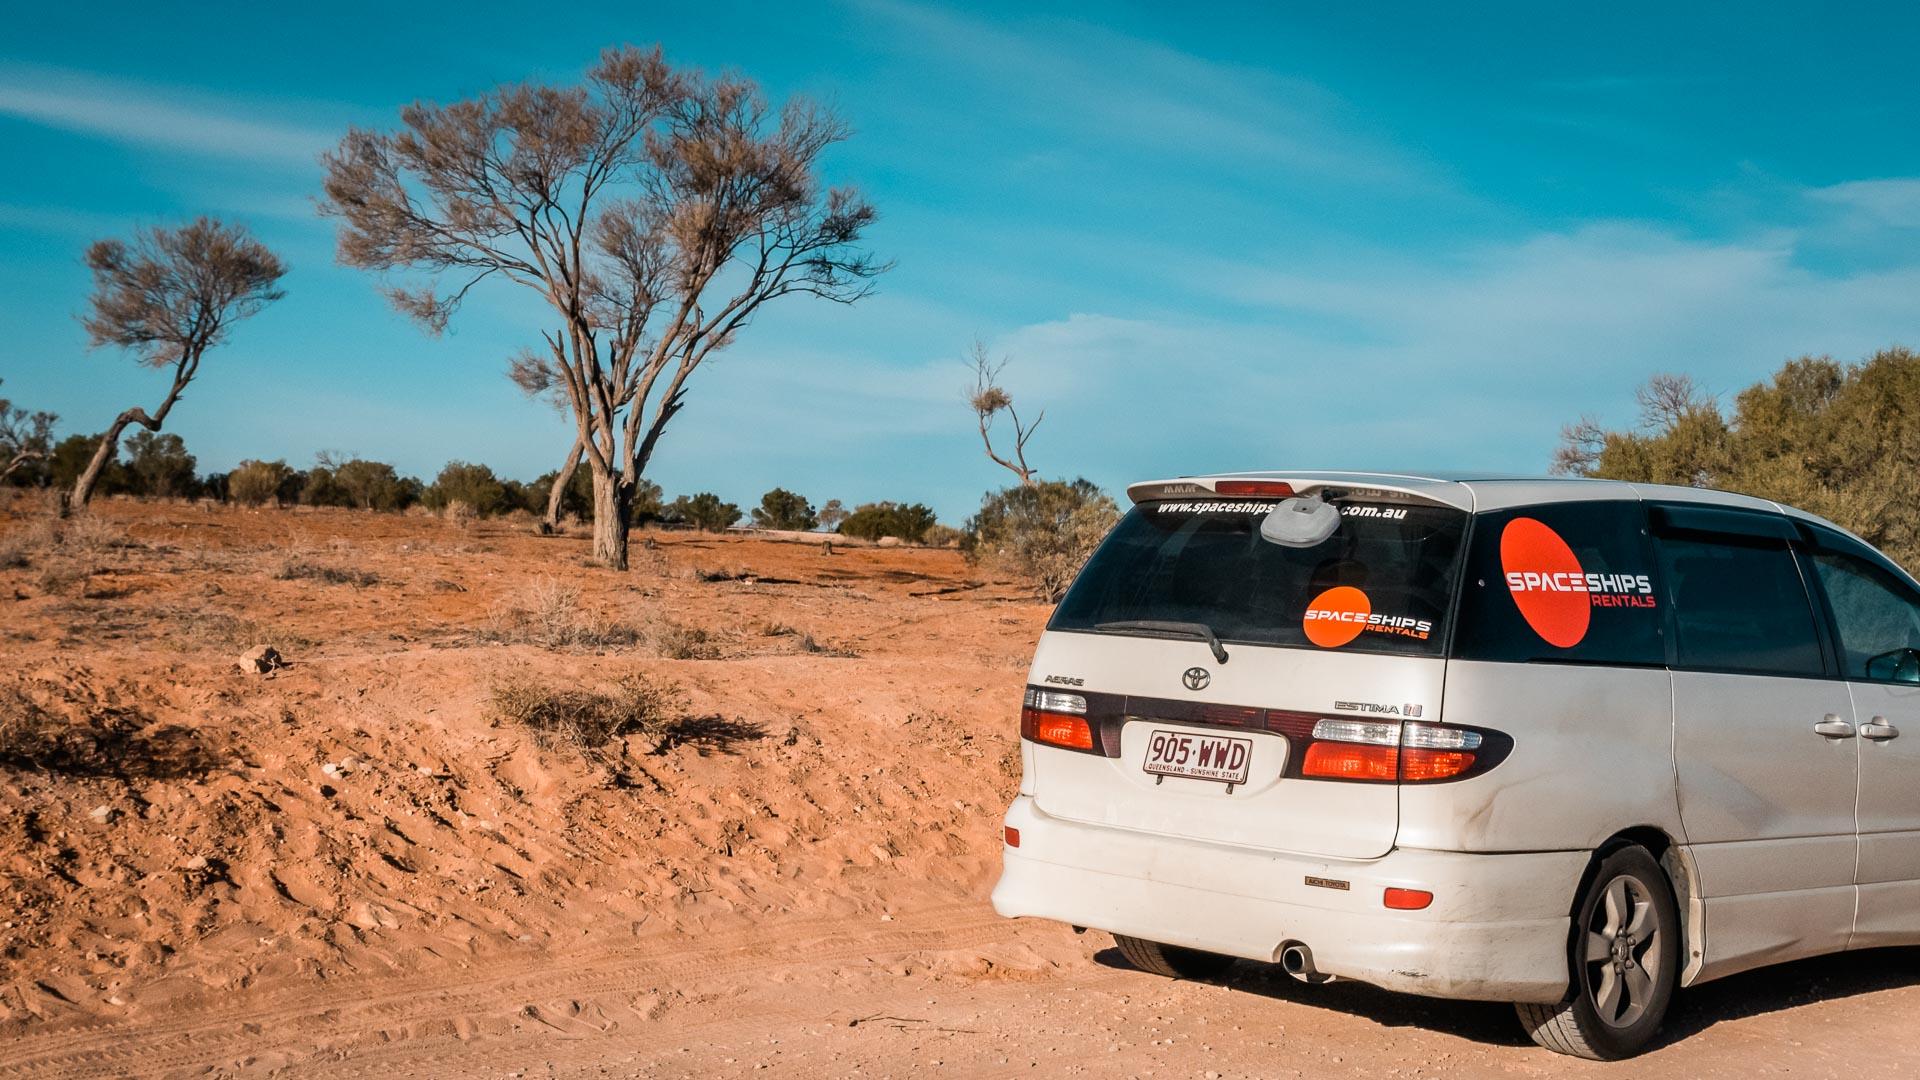 Samochód Spaceships Rentals, Outback, Australia